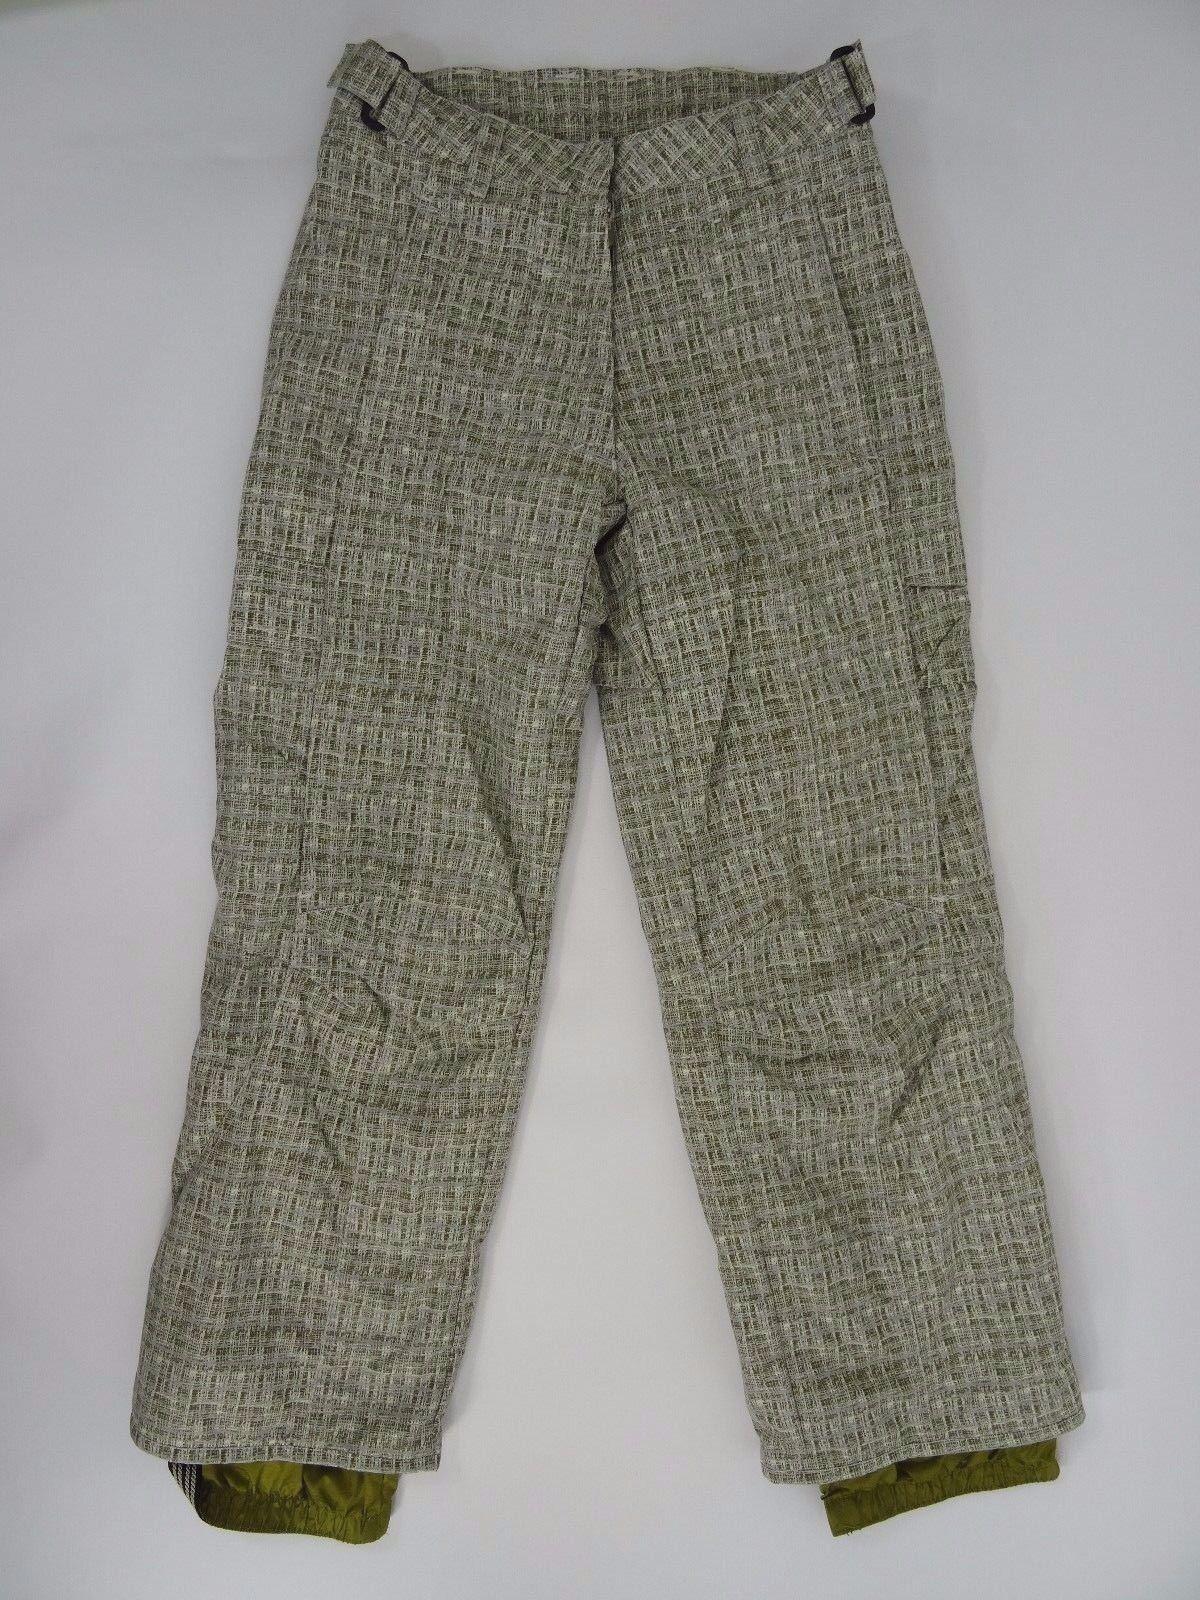 Obermeyer Snowboard Pants Green Plaid Womens size 4